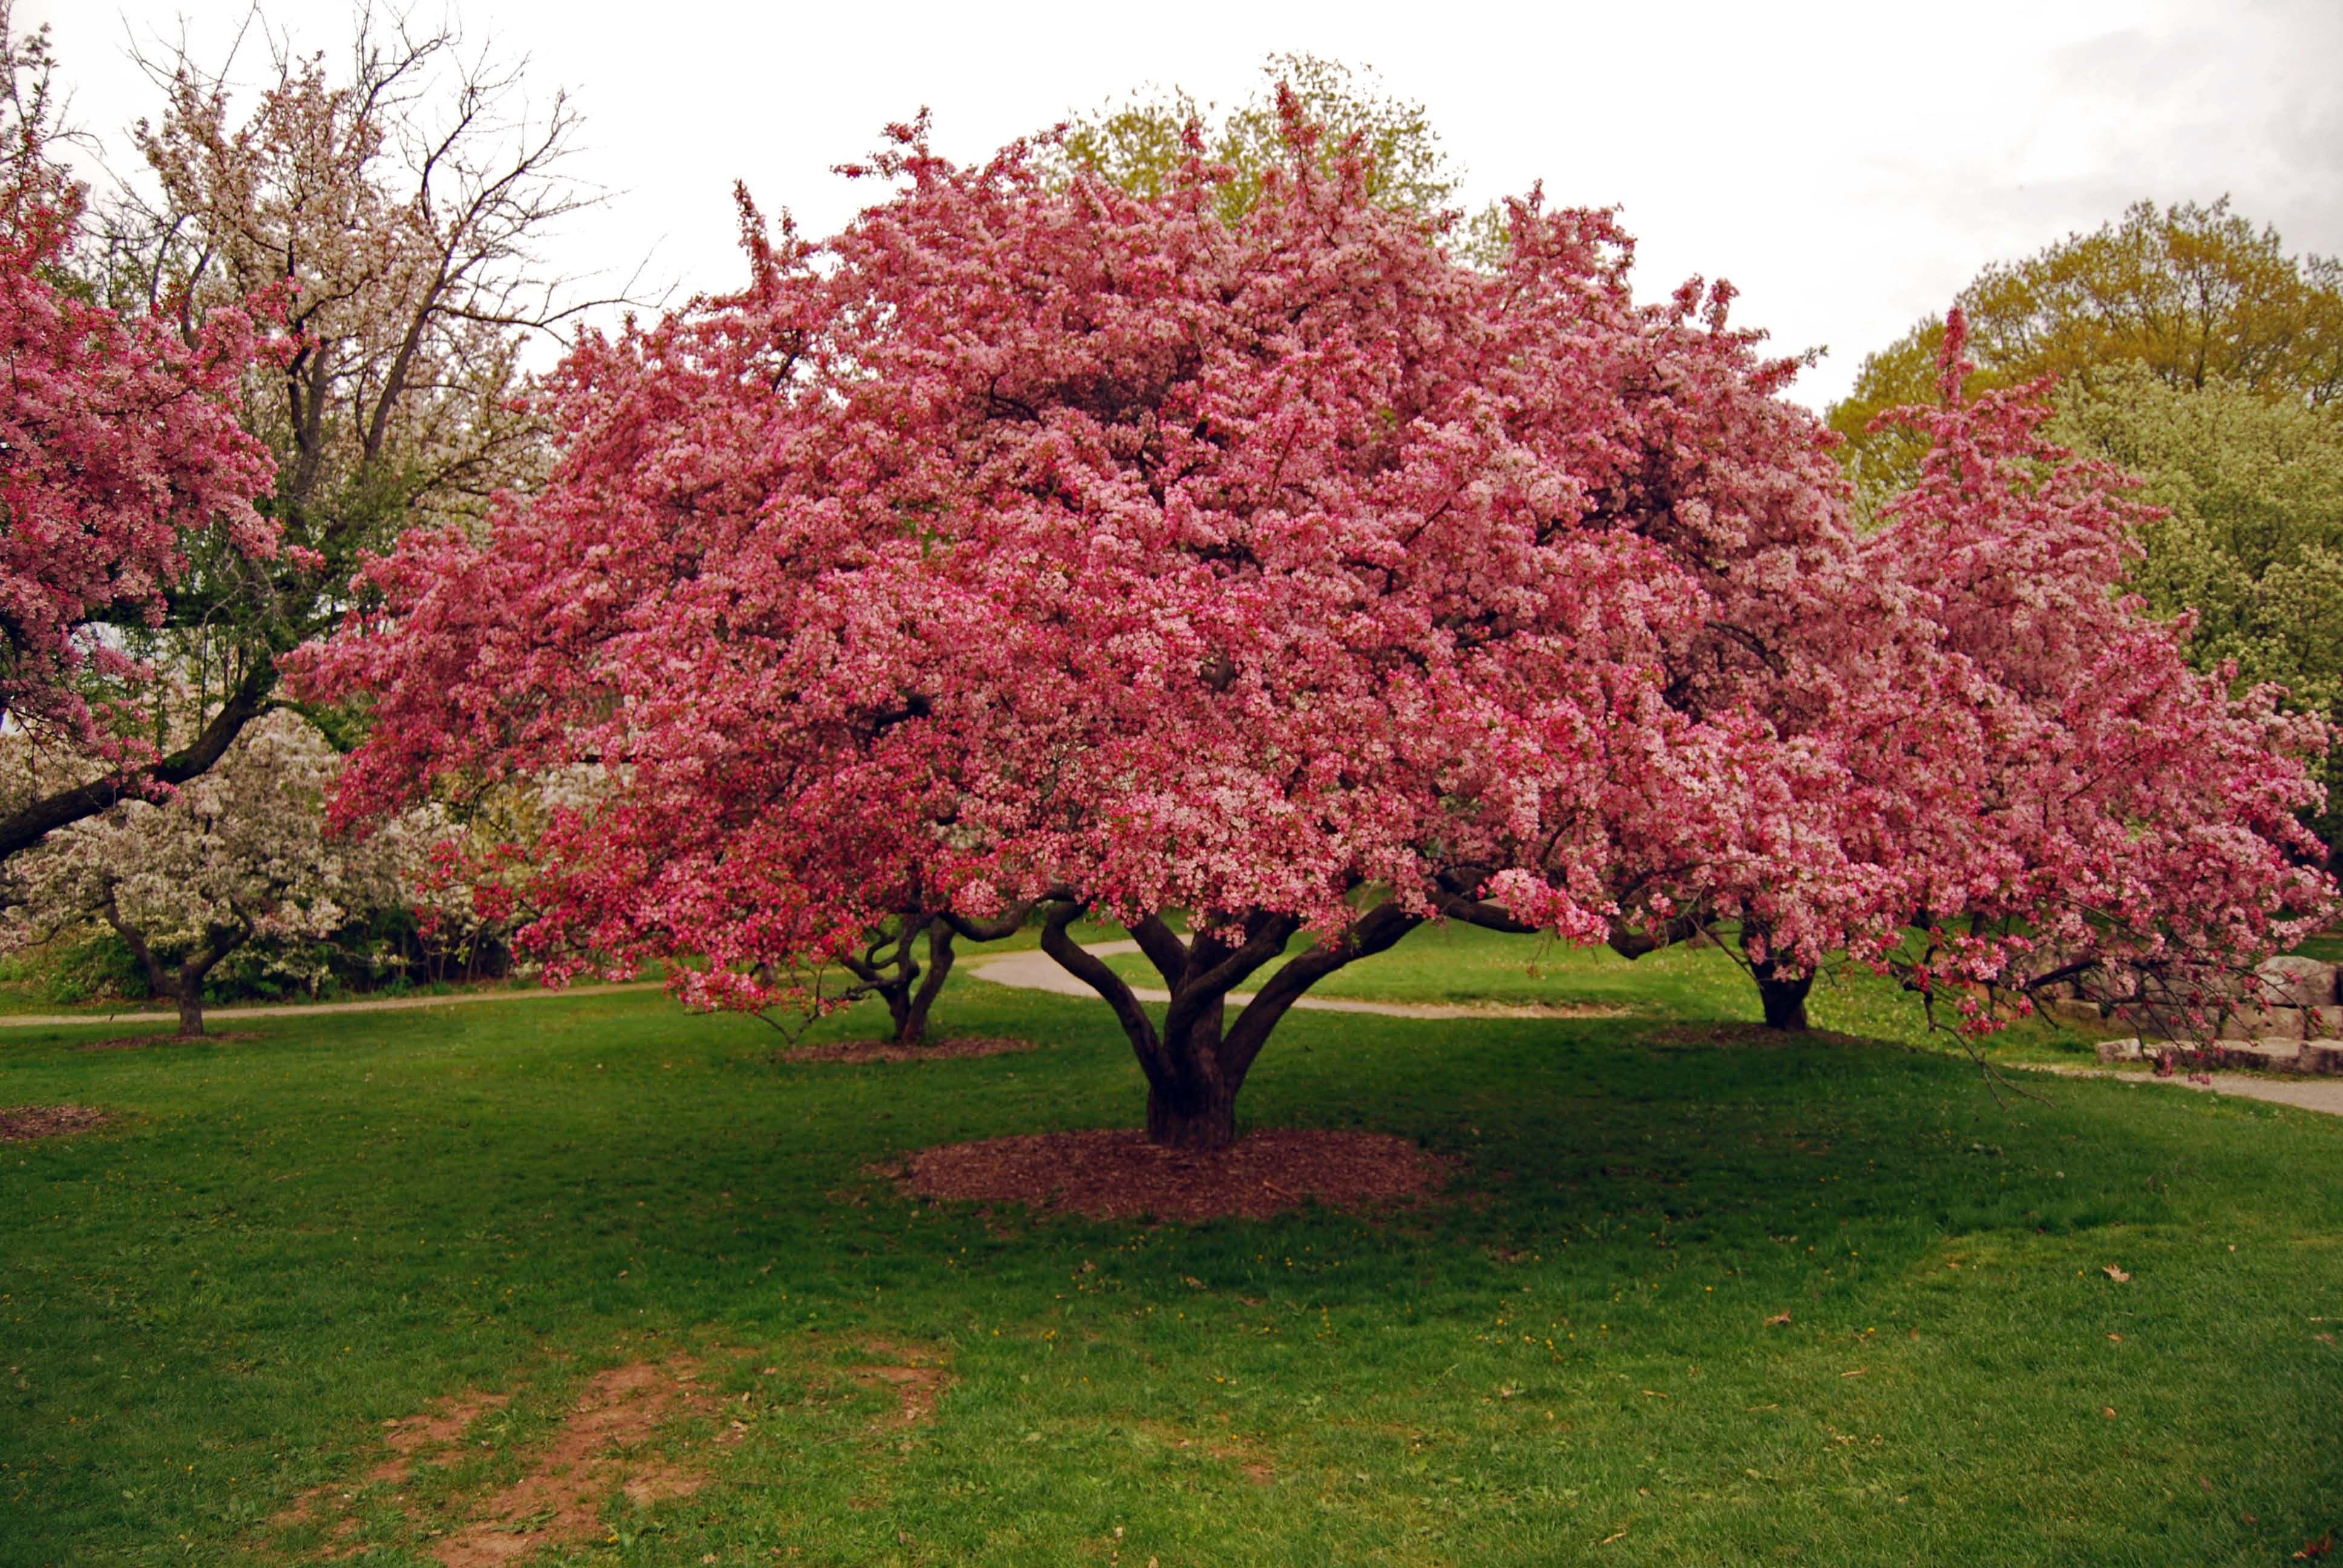 Flowering crab apple loved when this tree bloomed in grandpaus